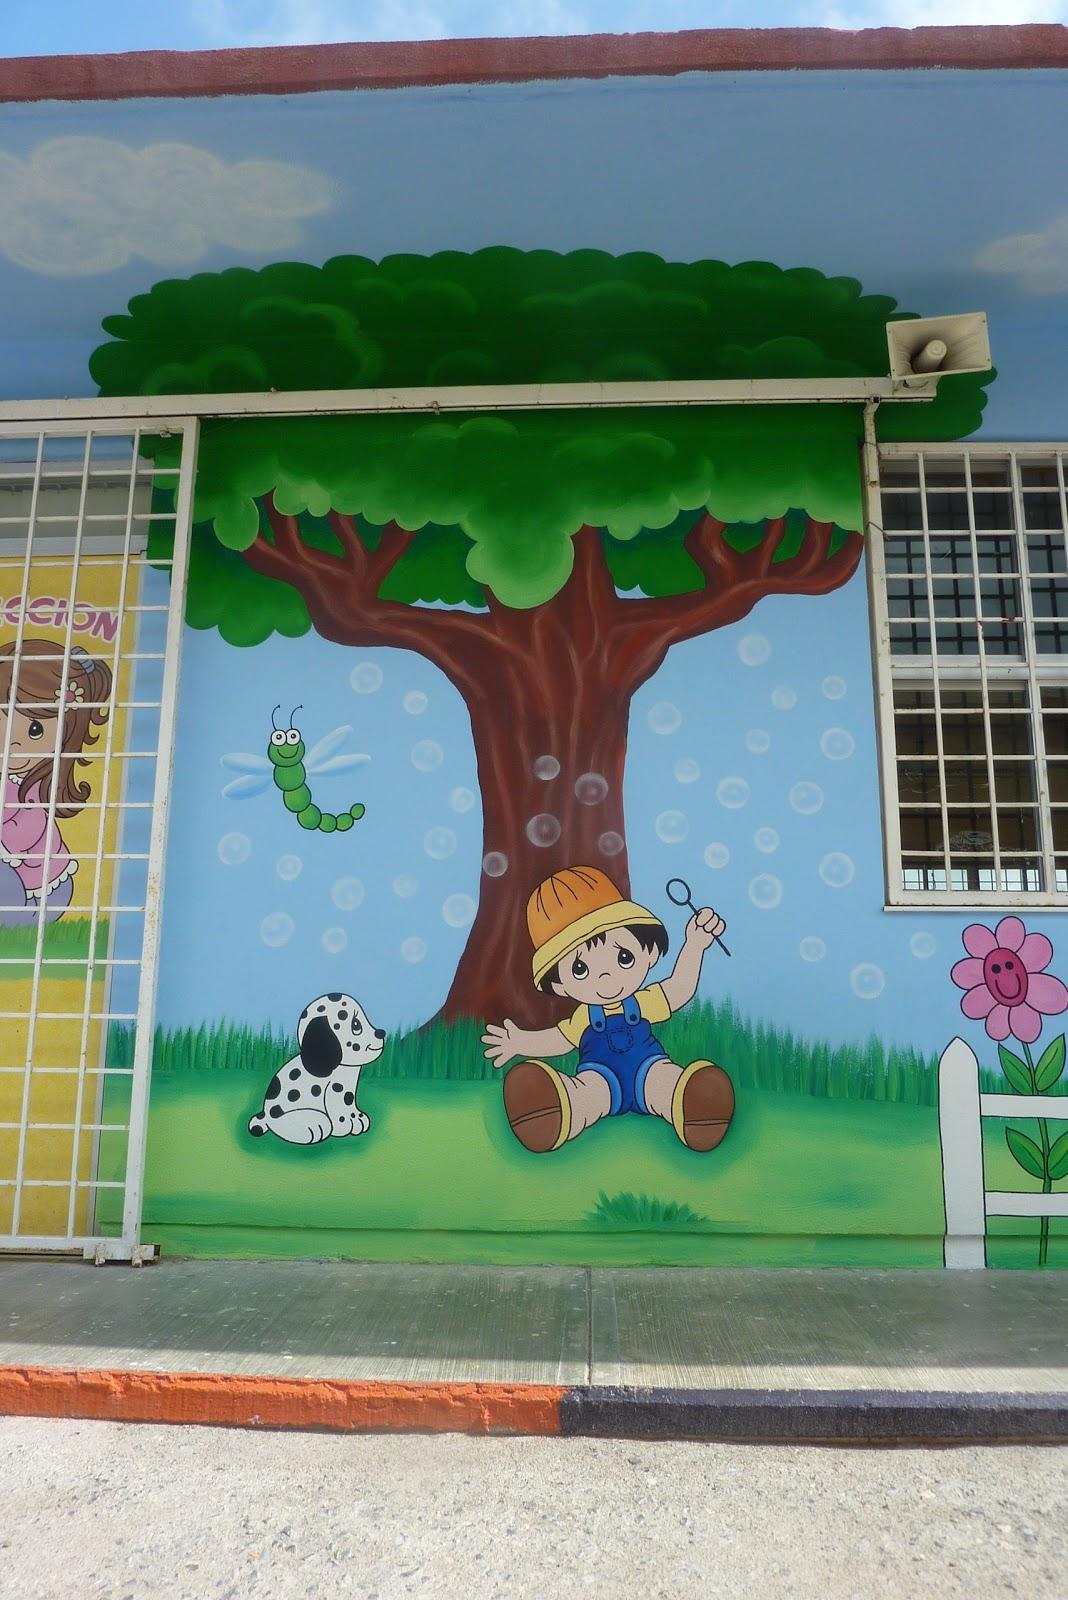 Villa Infantil Jardin De Nios   Puerta Norte Acaponeta Una Historia ...